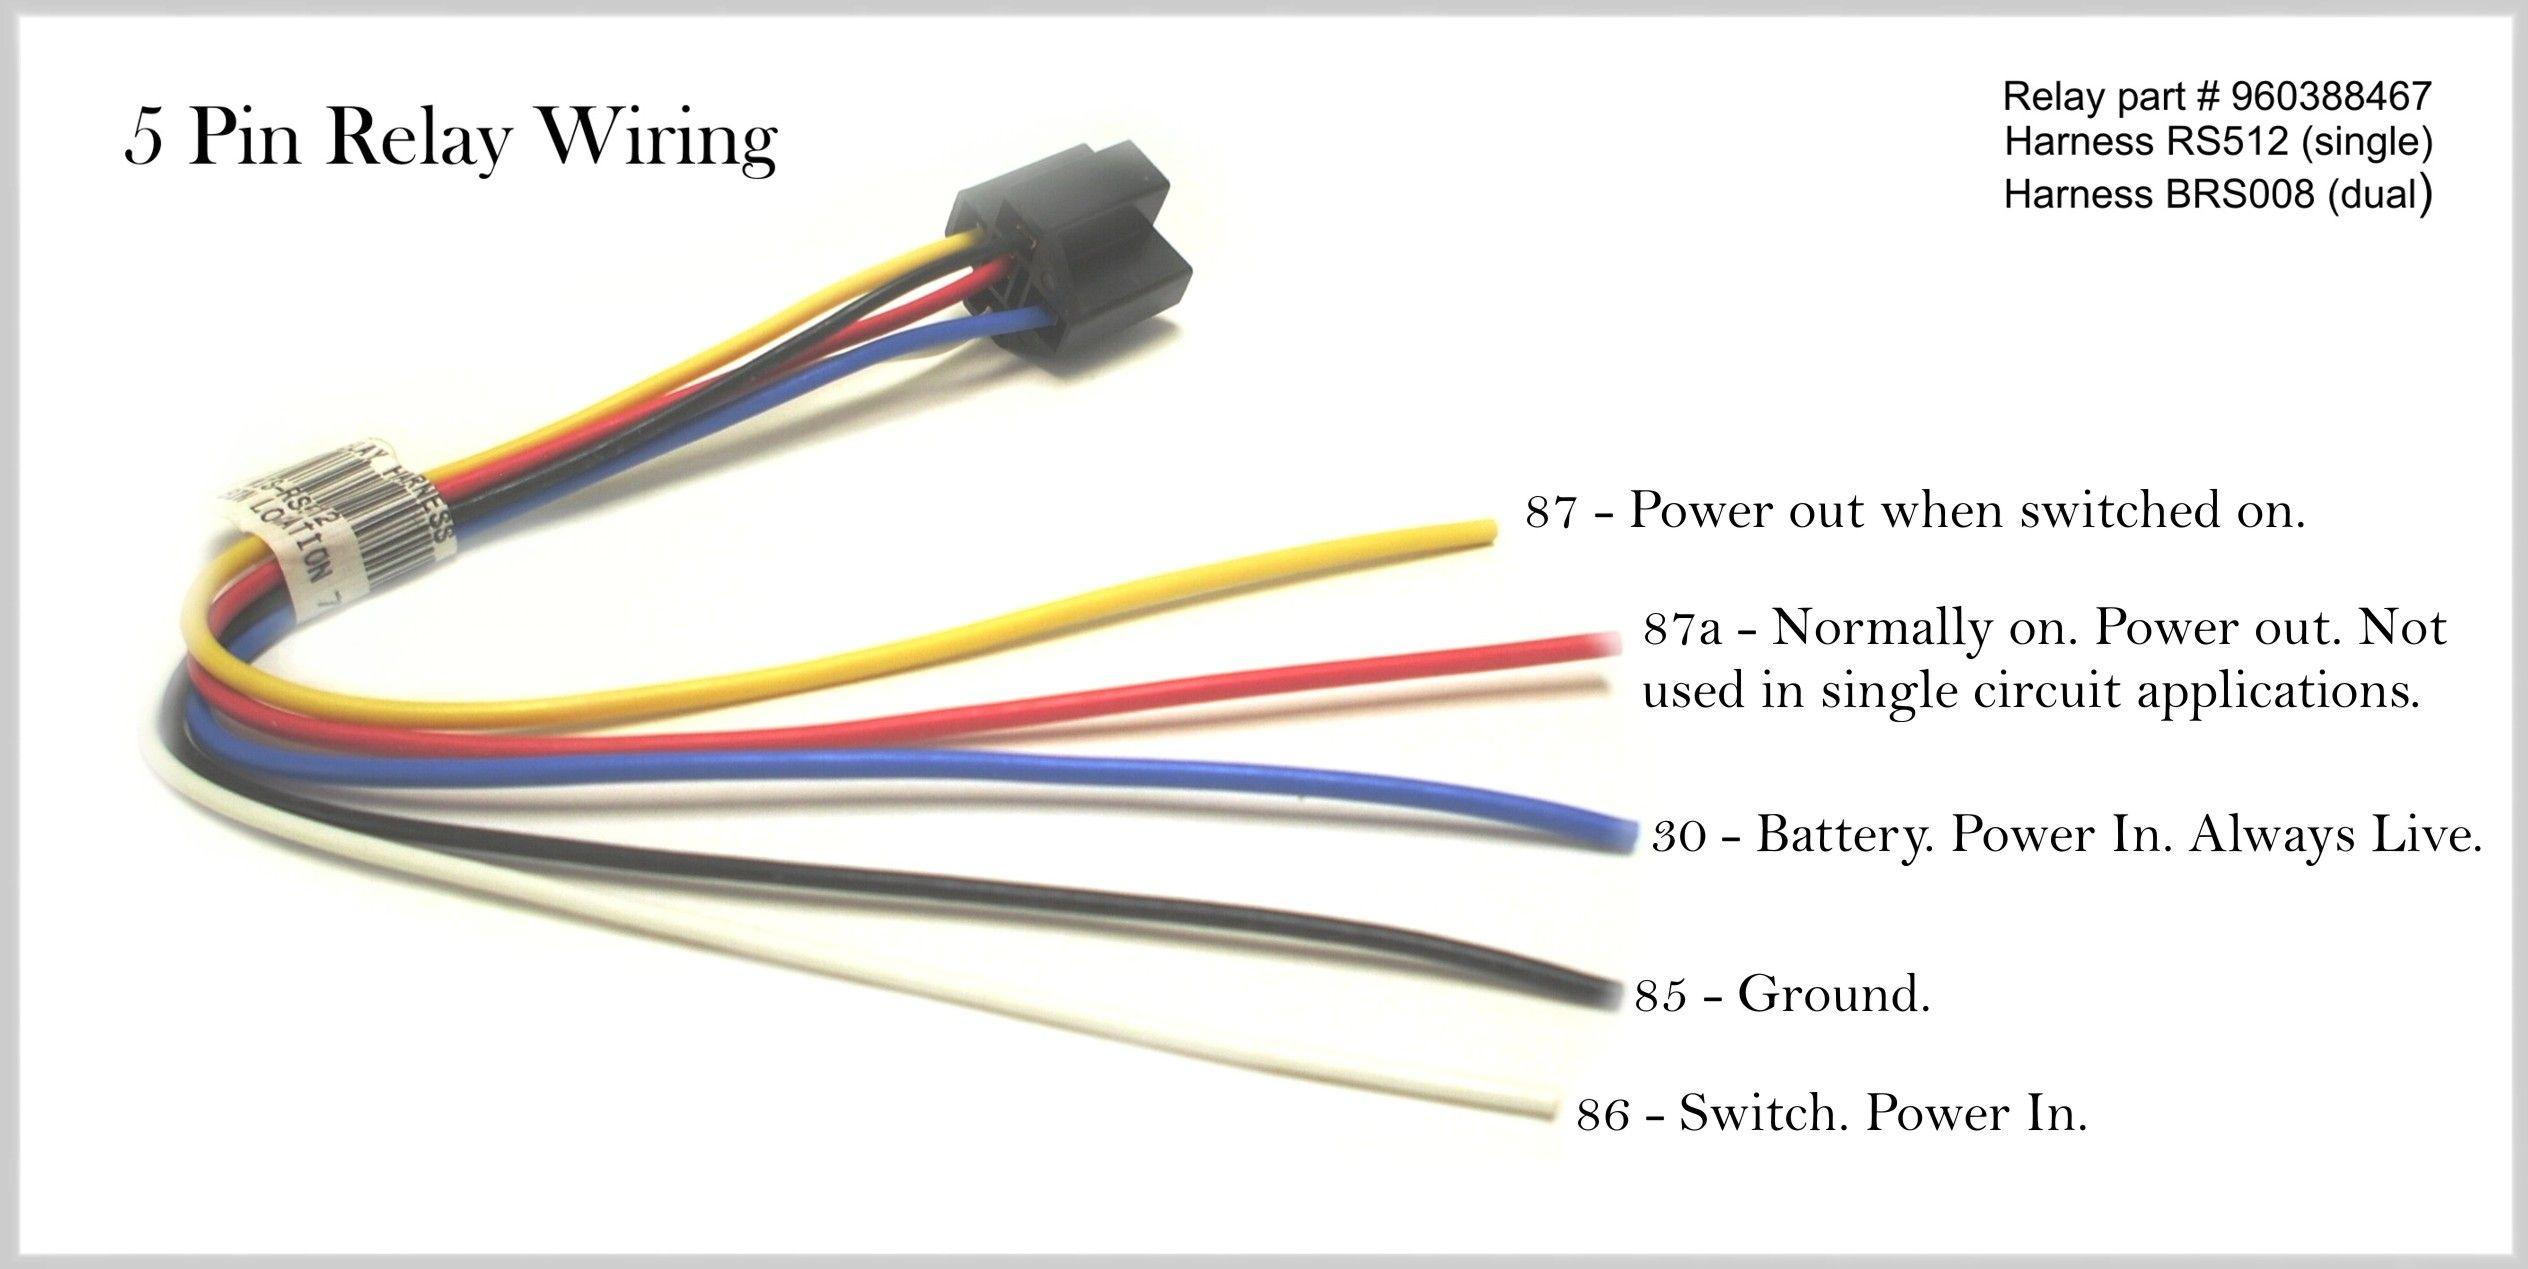 5 pin relay wiring diagram fog lights 1986 porsche 944 radio dodge power wagon pinterest cars